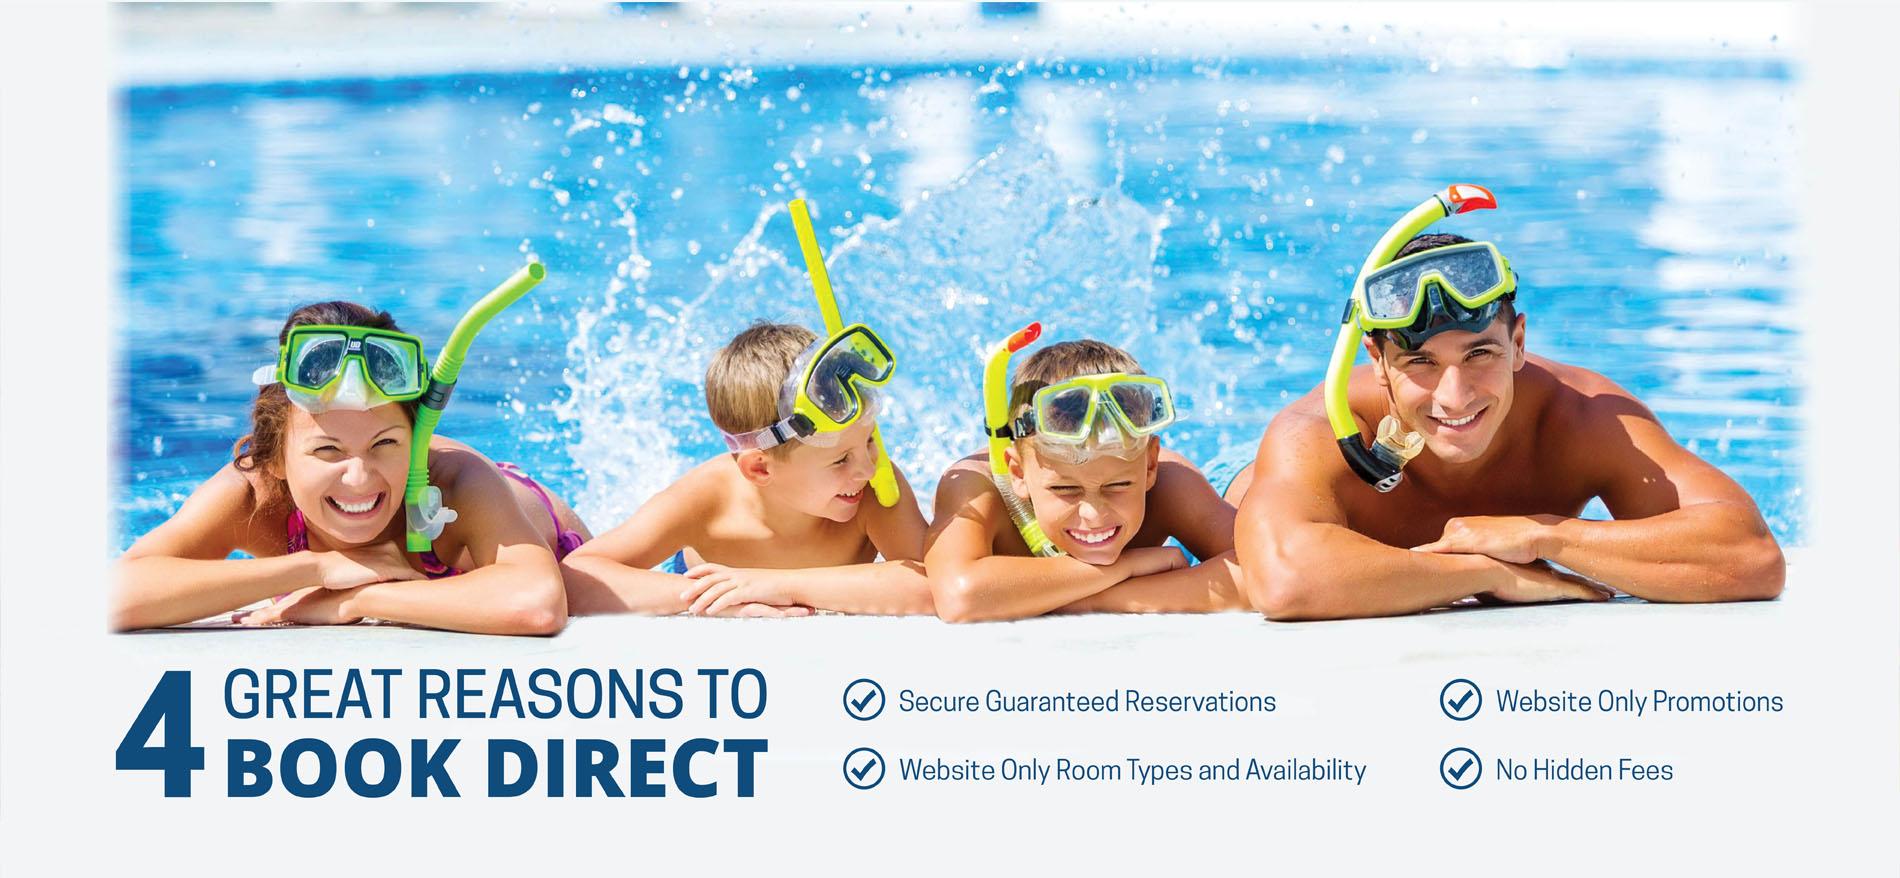 The Enclave Hotel & Suites Orlando hotel book direct